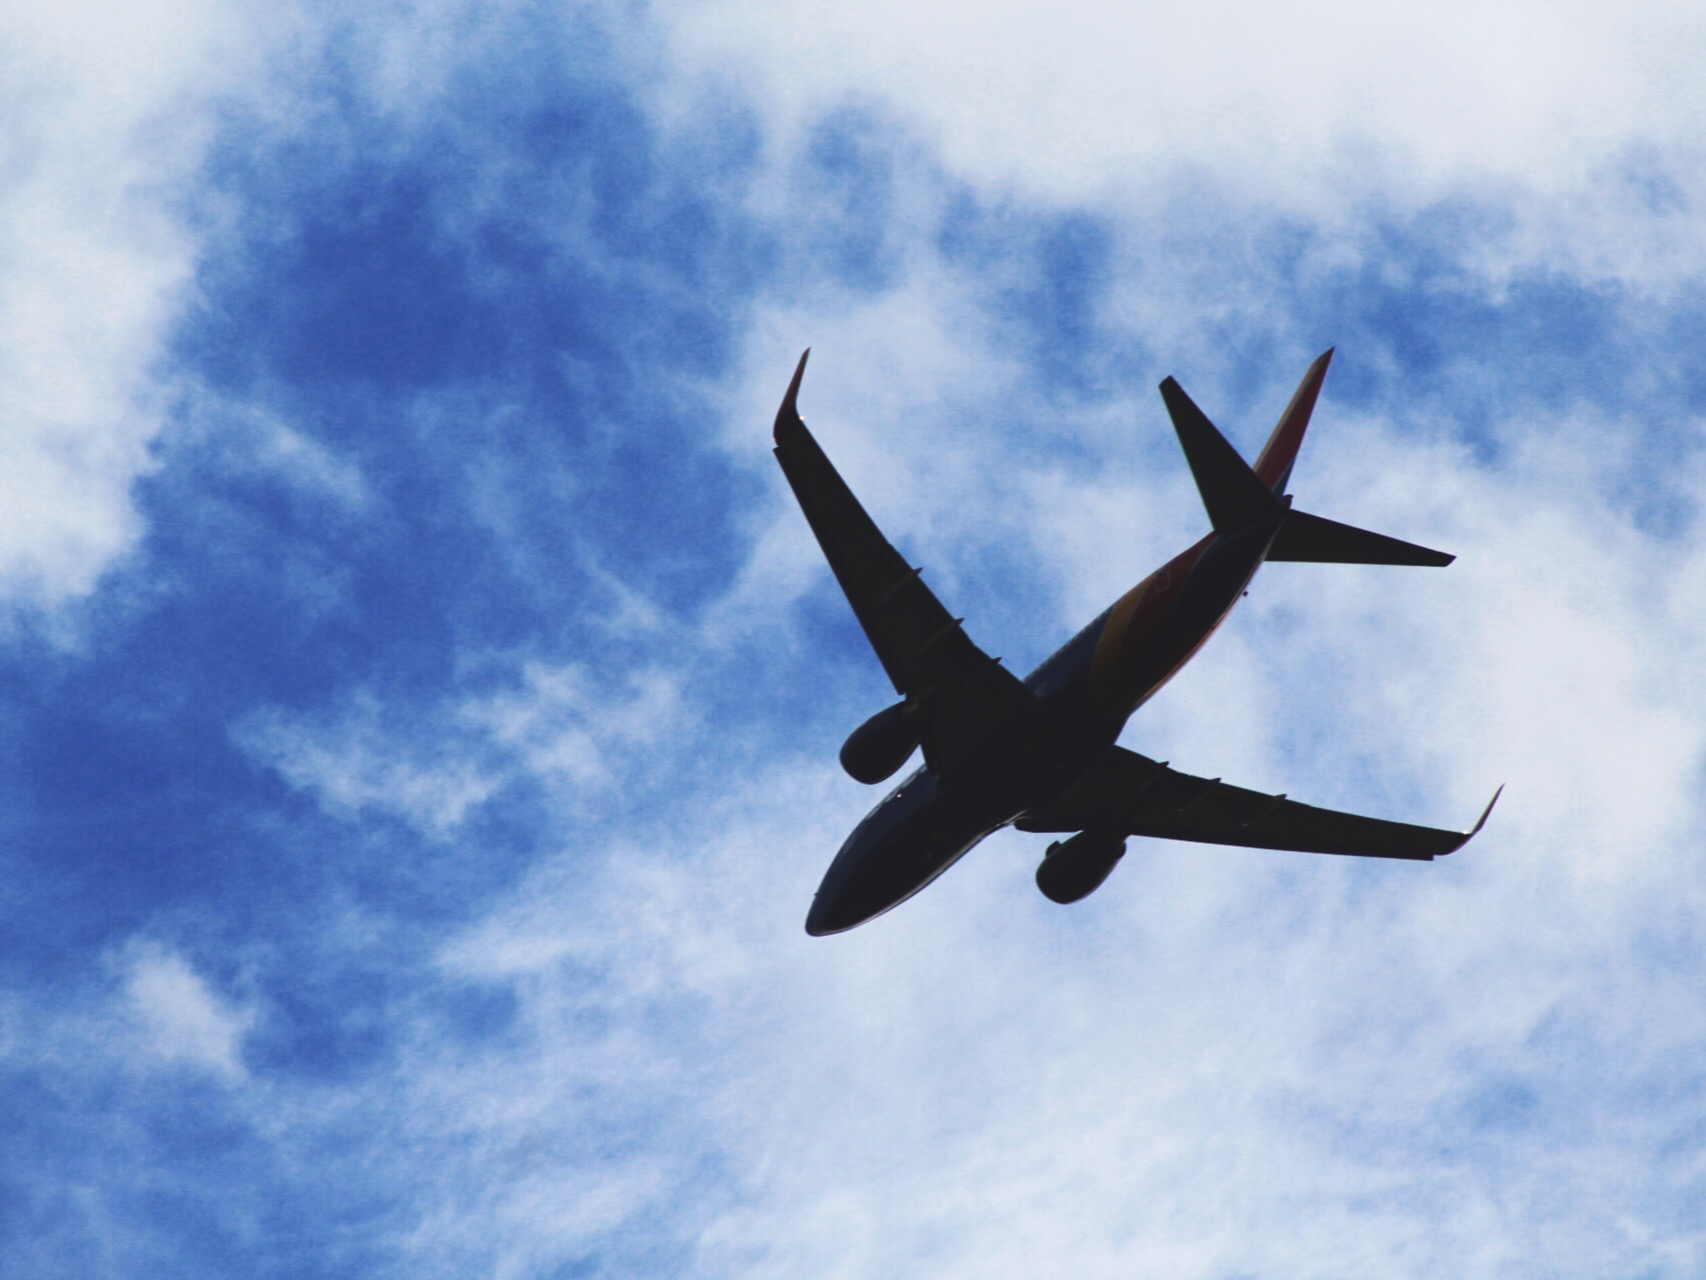 Fly Far Away ️ ⛅️ Freetoedit Flight Plane Sky Cloud